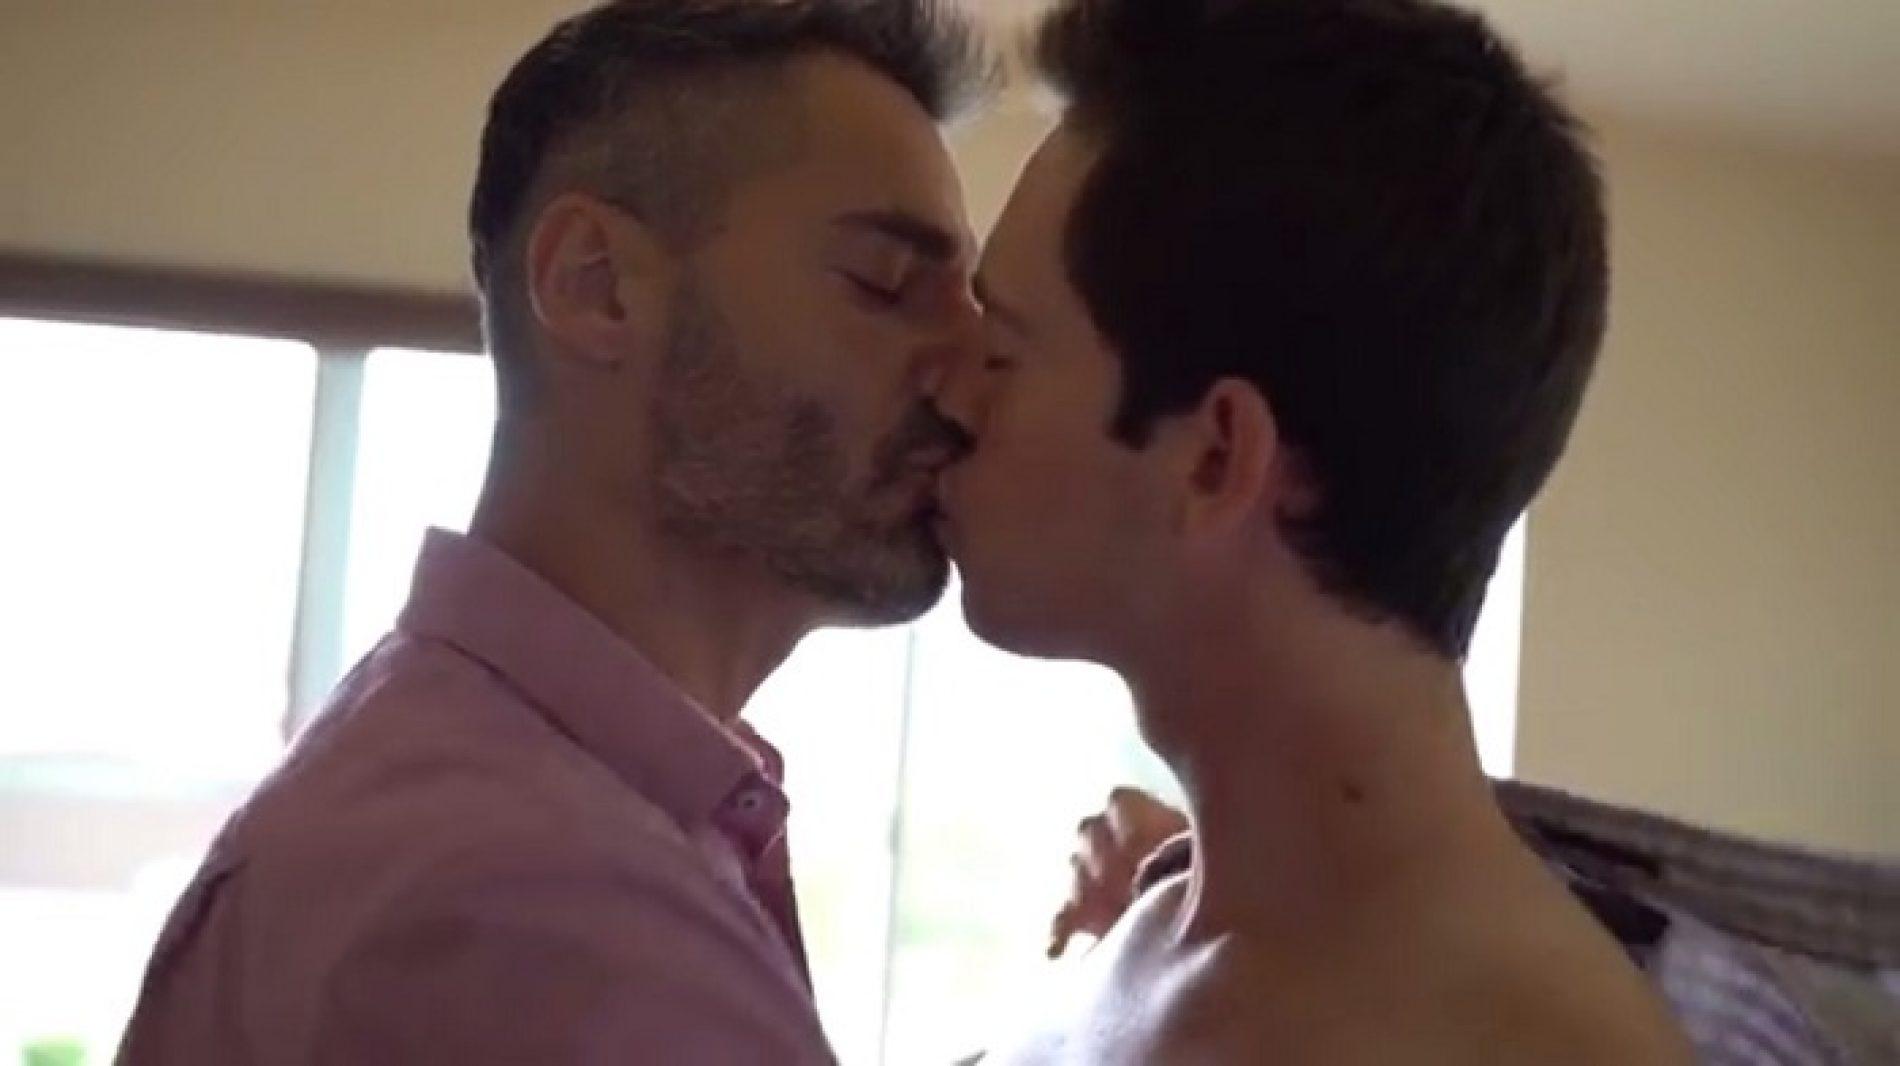 Nifty gay erotic stories nifty erotic stories